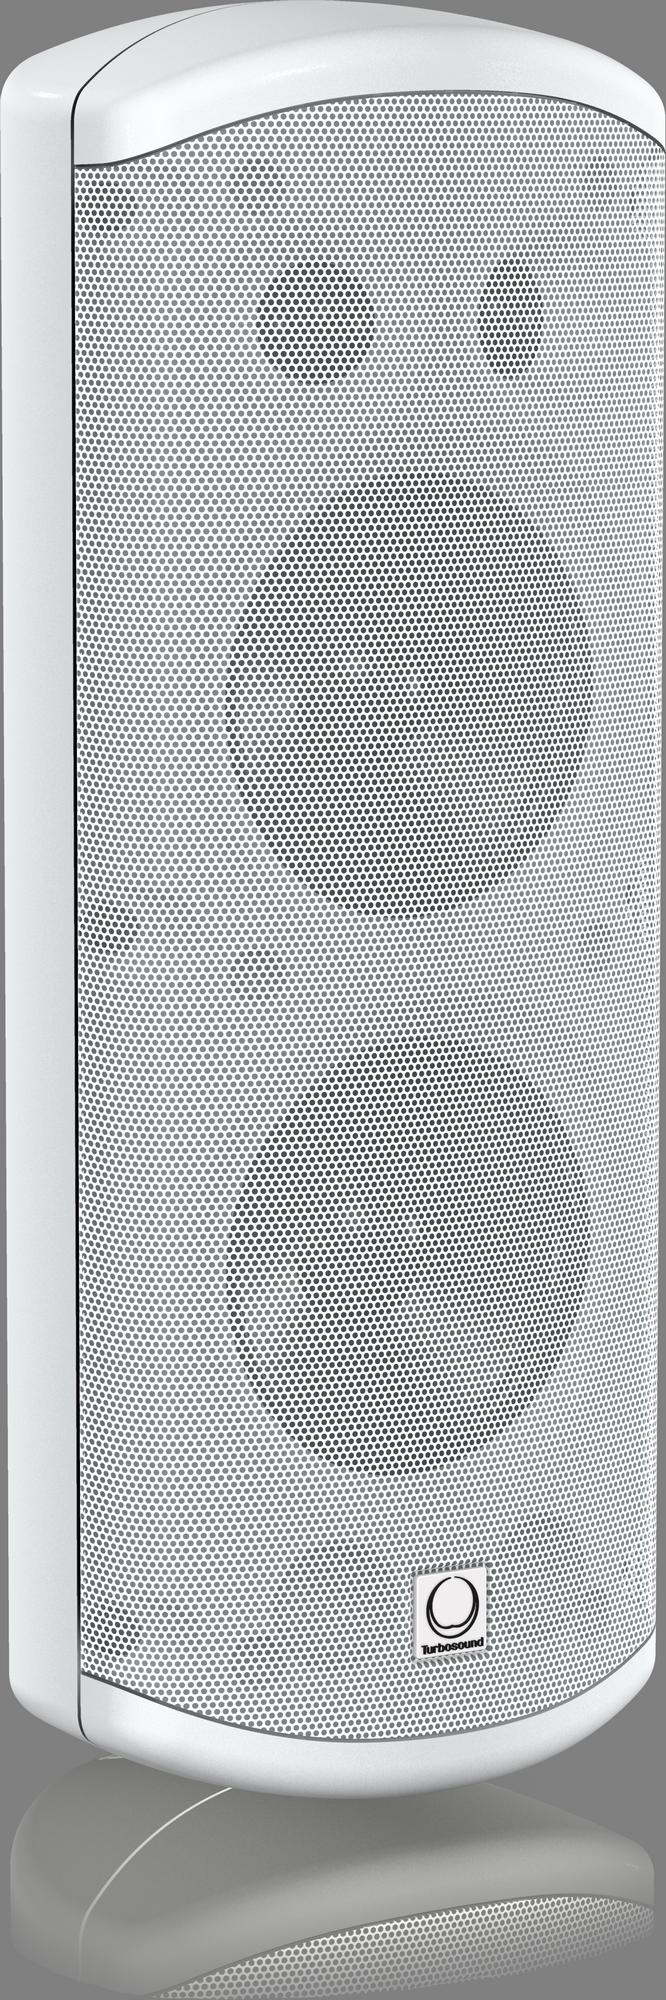 Turbosound  Impact TCI53-TR-WH - Haut-parleur d'installation